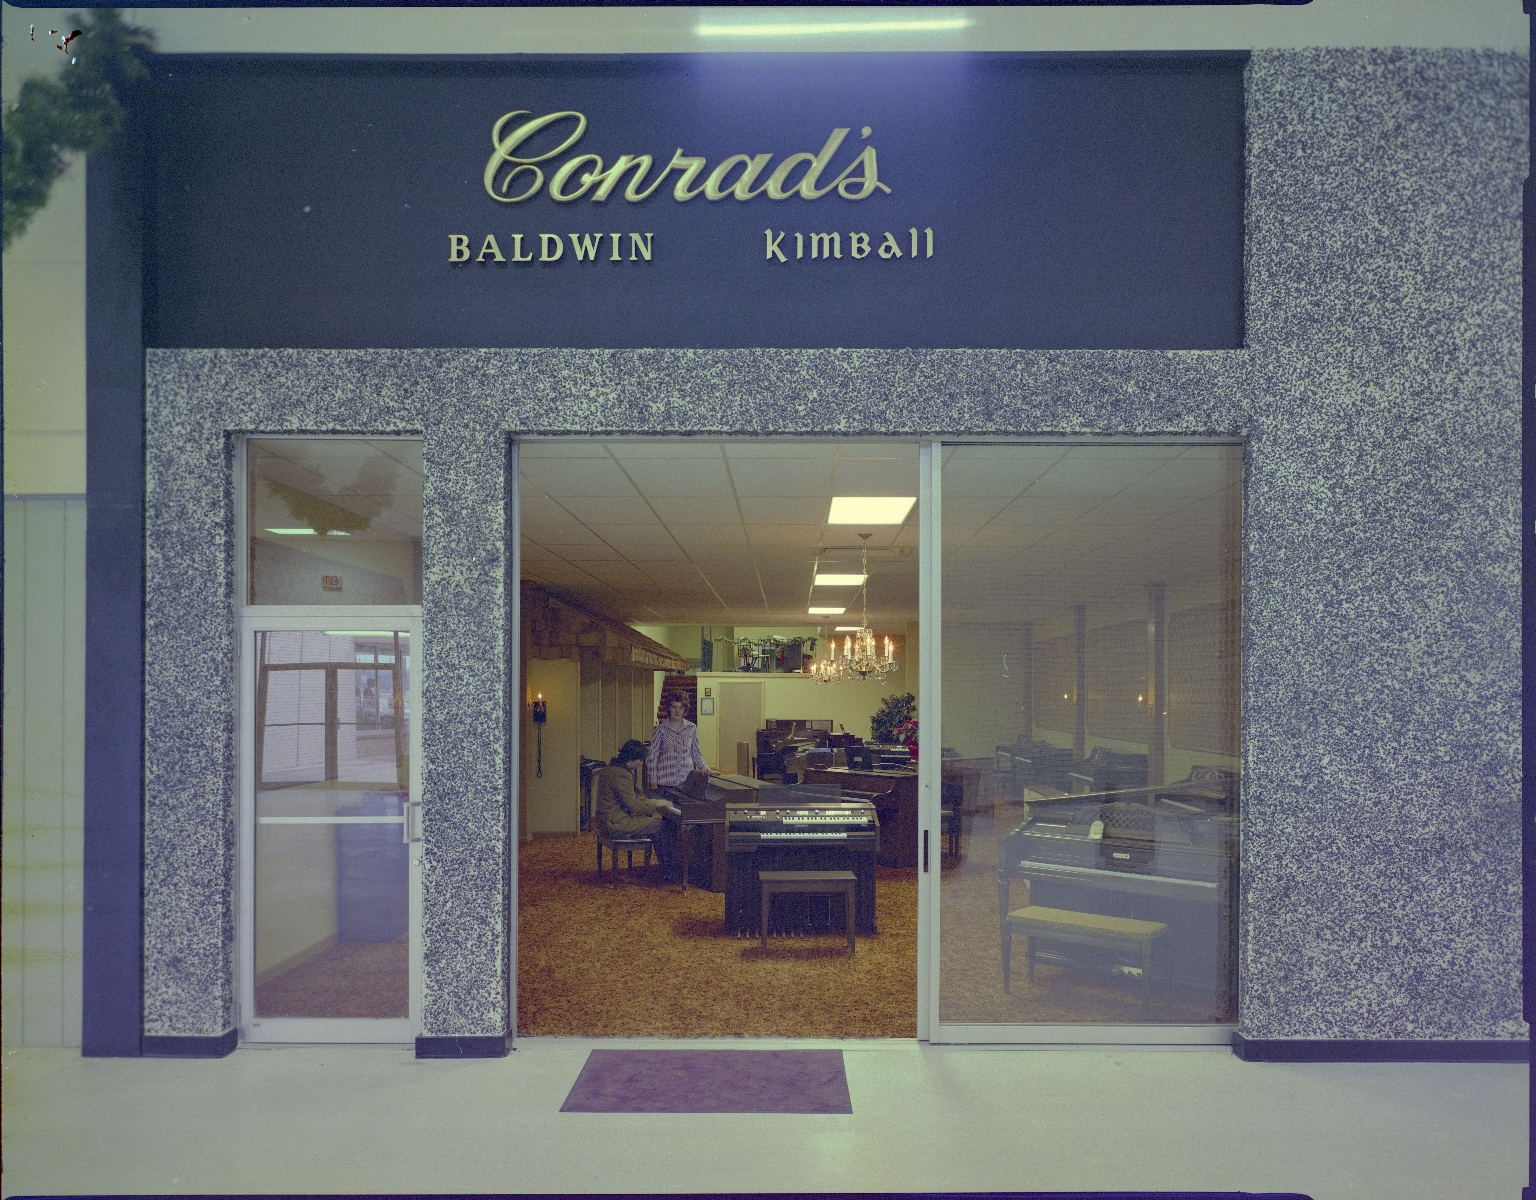 Paducah Mall/Conrads